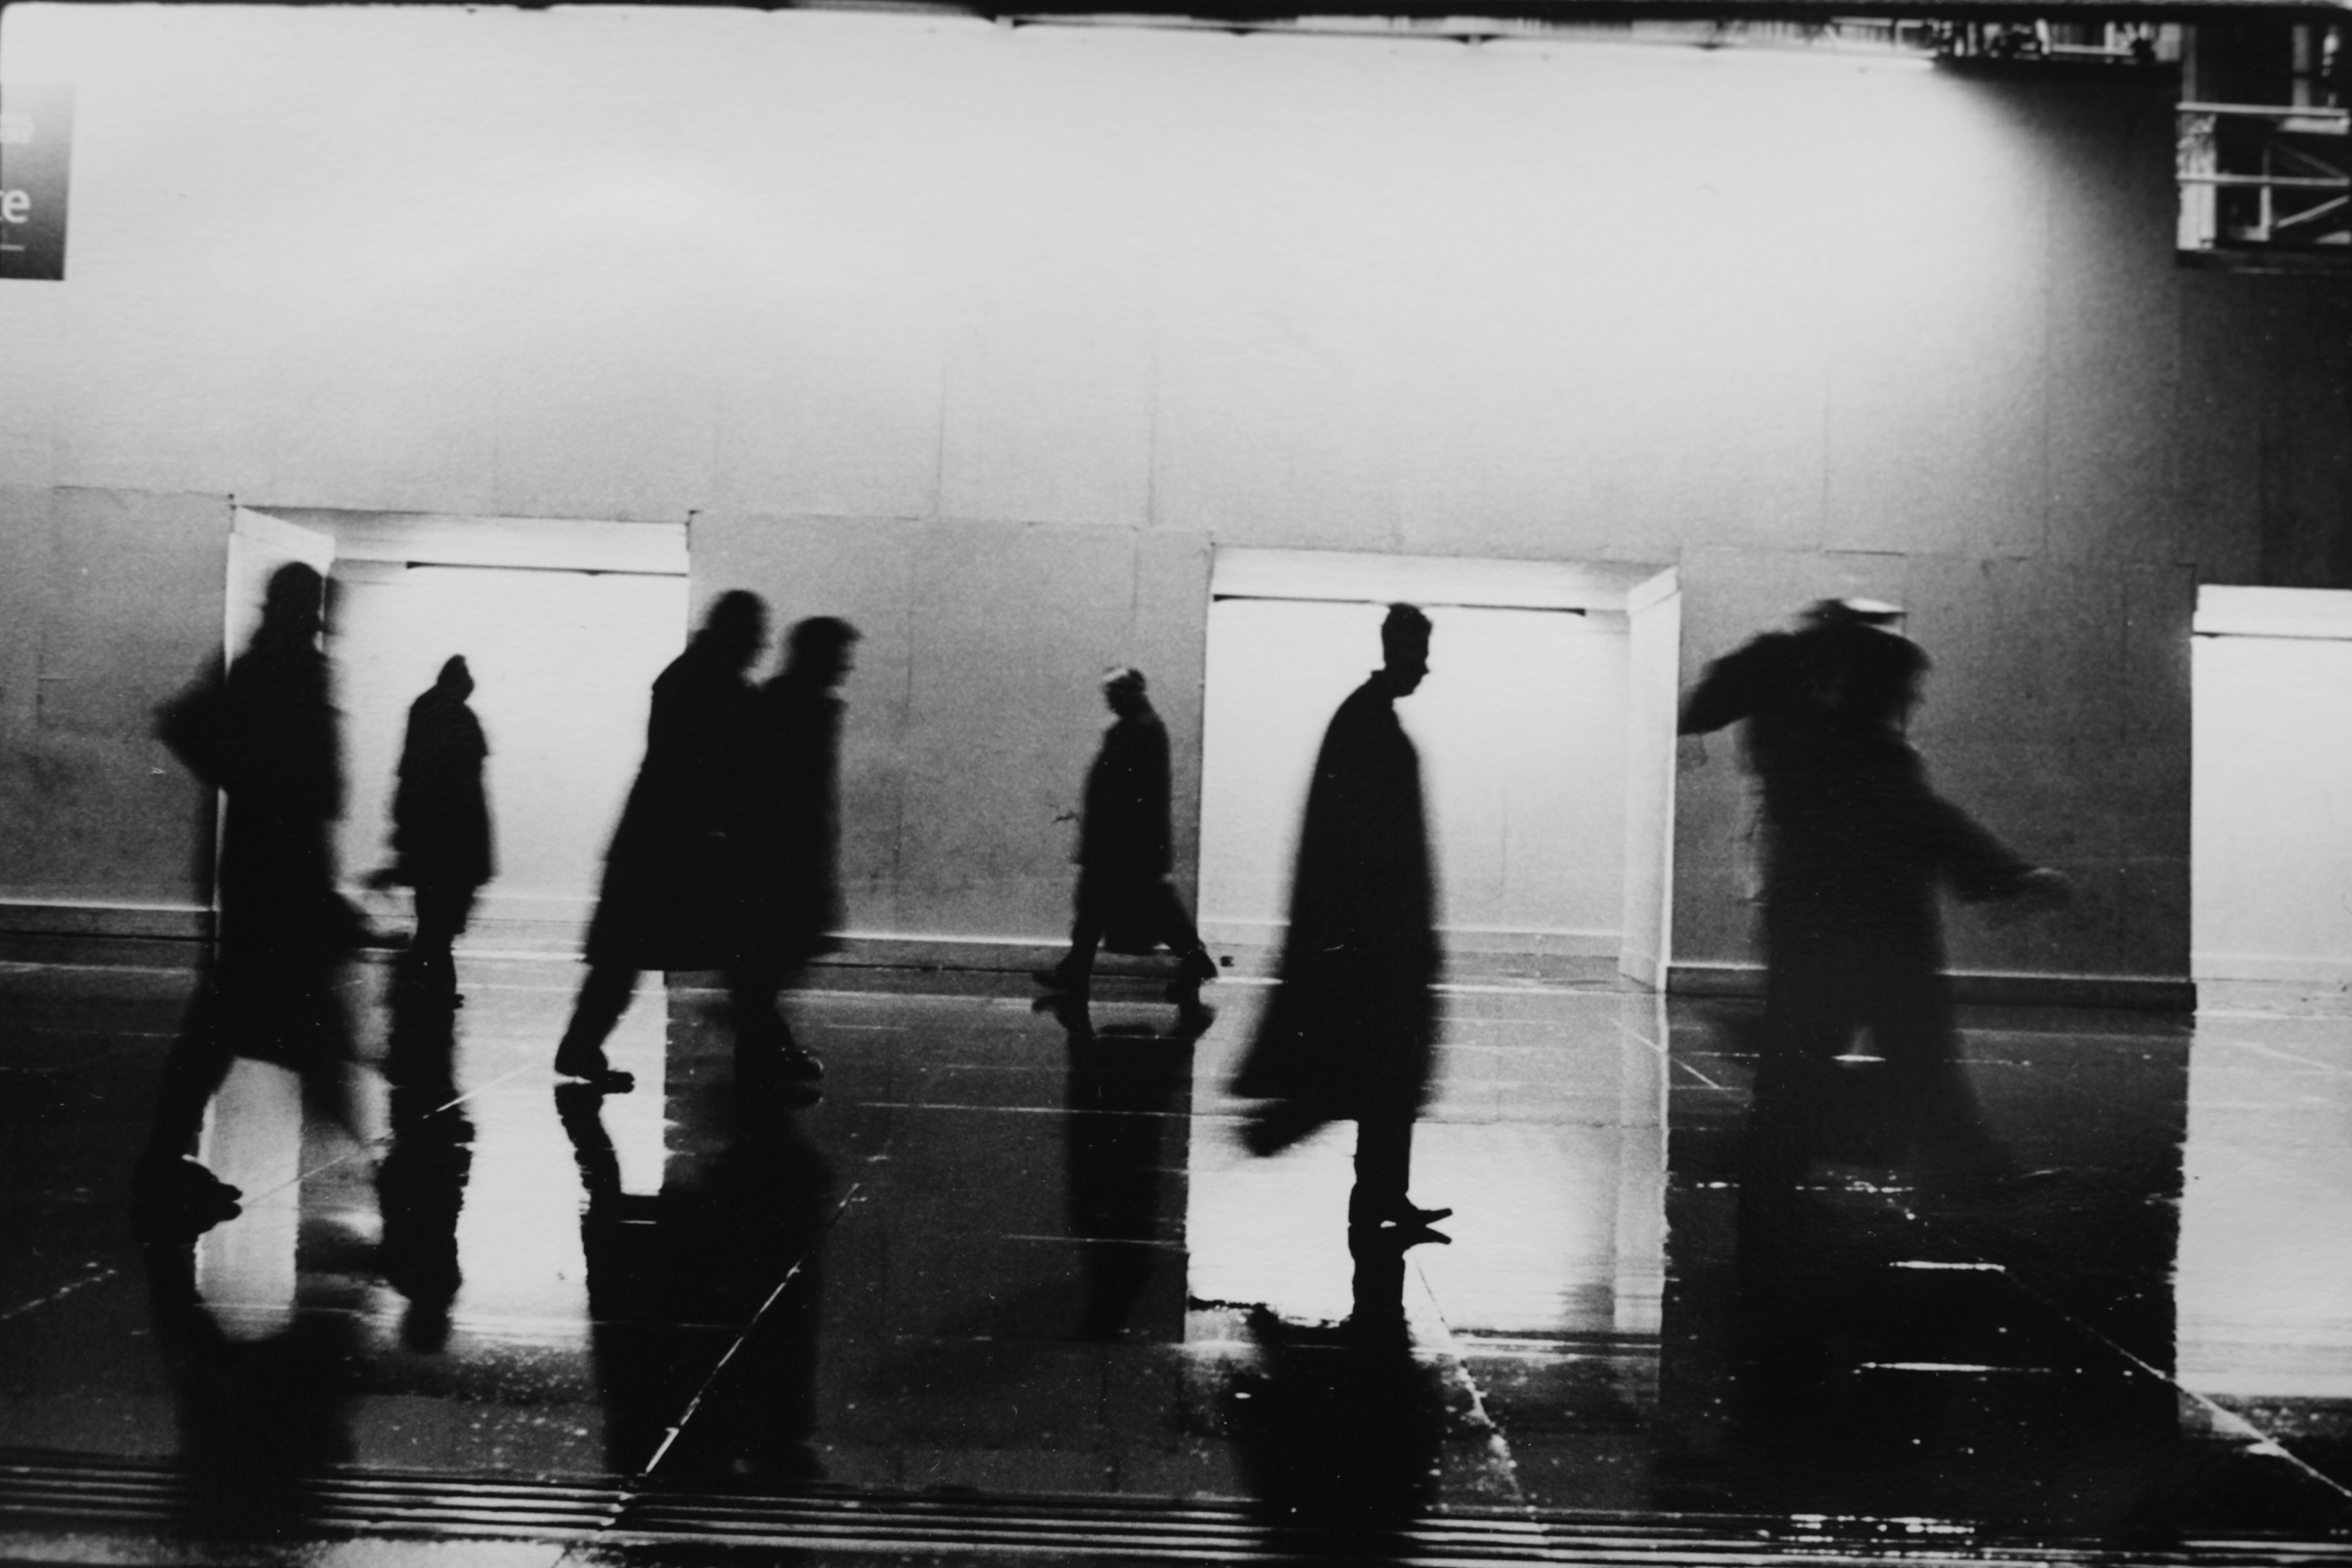 © Joakim Kocjancic   Titel: Trafalgar Square, London, 2005. Från serien: Europea. Bildmått: 25,5x38 cm Teknik: silver gelatin fotografi, 2018. Upplaga: 6 + 1 AP  Signerad: Ja.  Pris: SEK 5.500